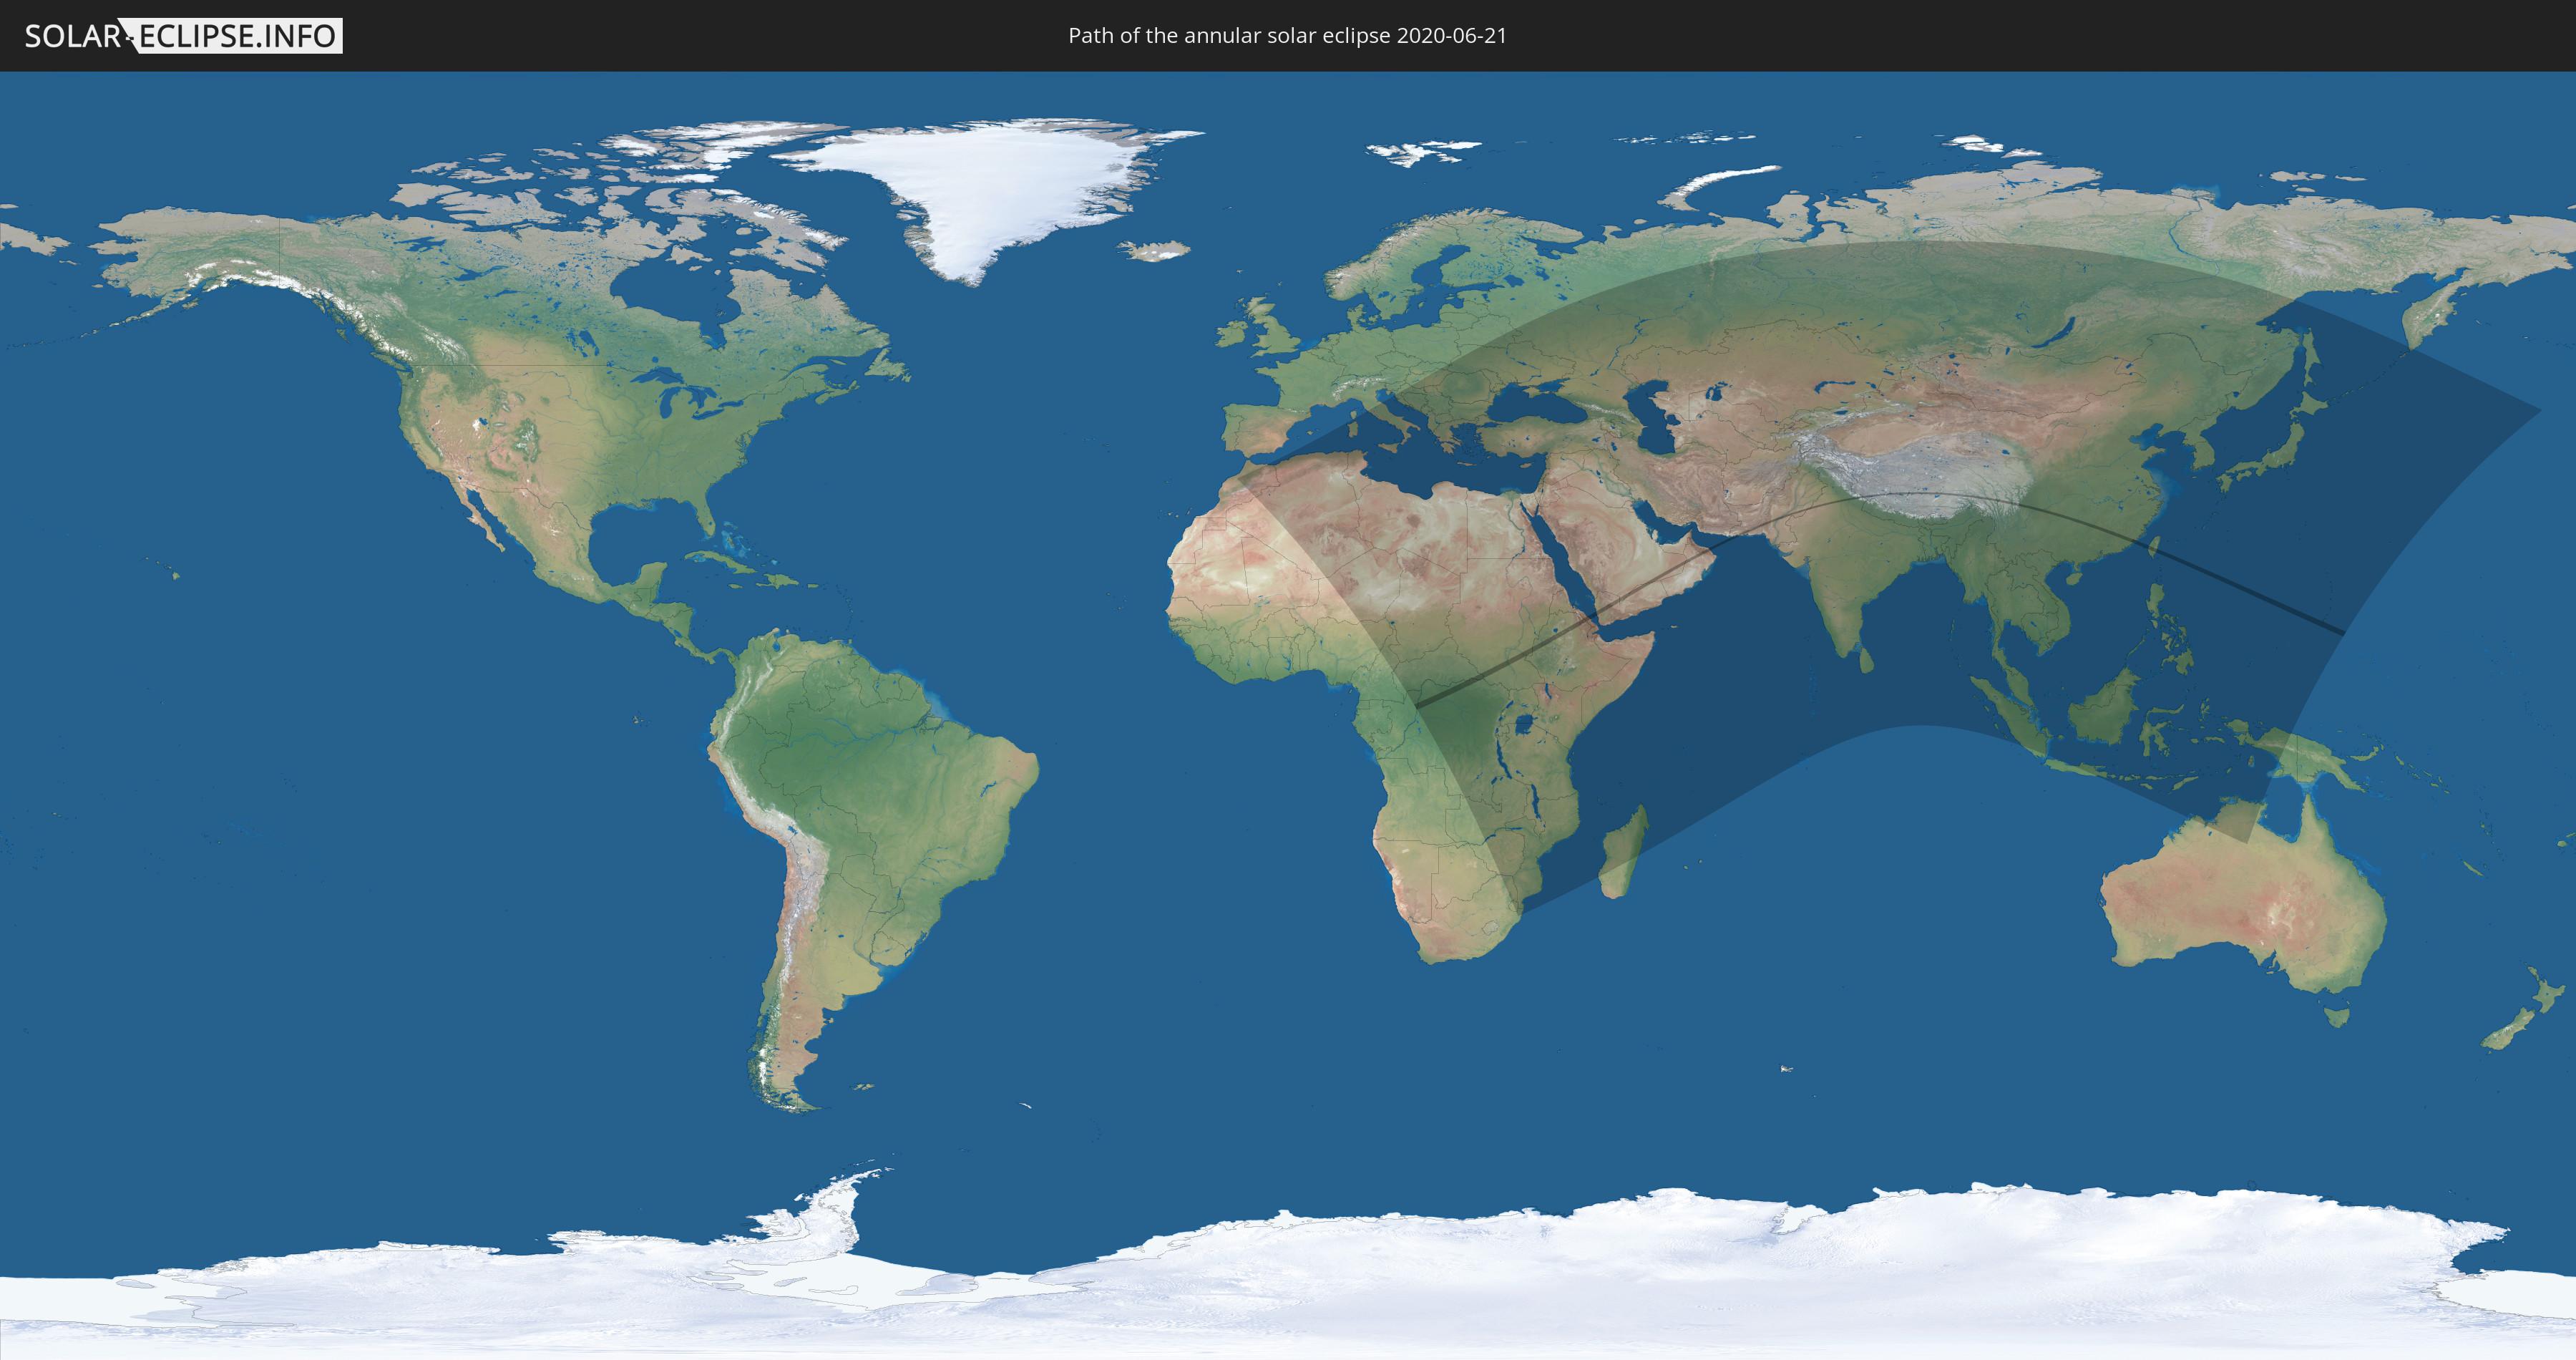 Solar Eclipse 2020 World Map Annular solar eclipse of 06/21/2020